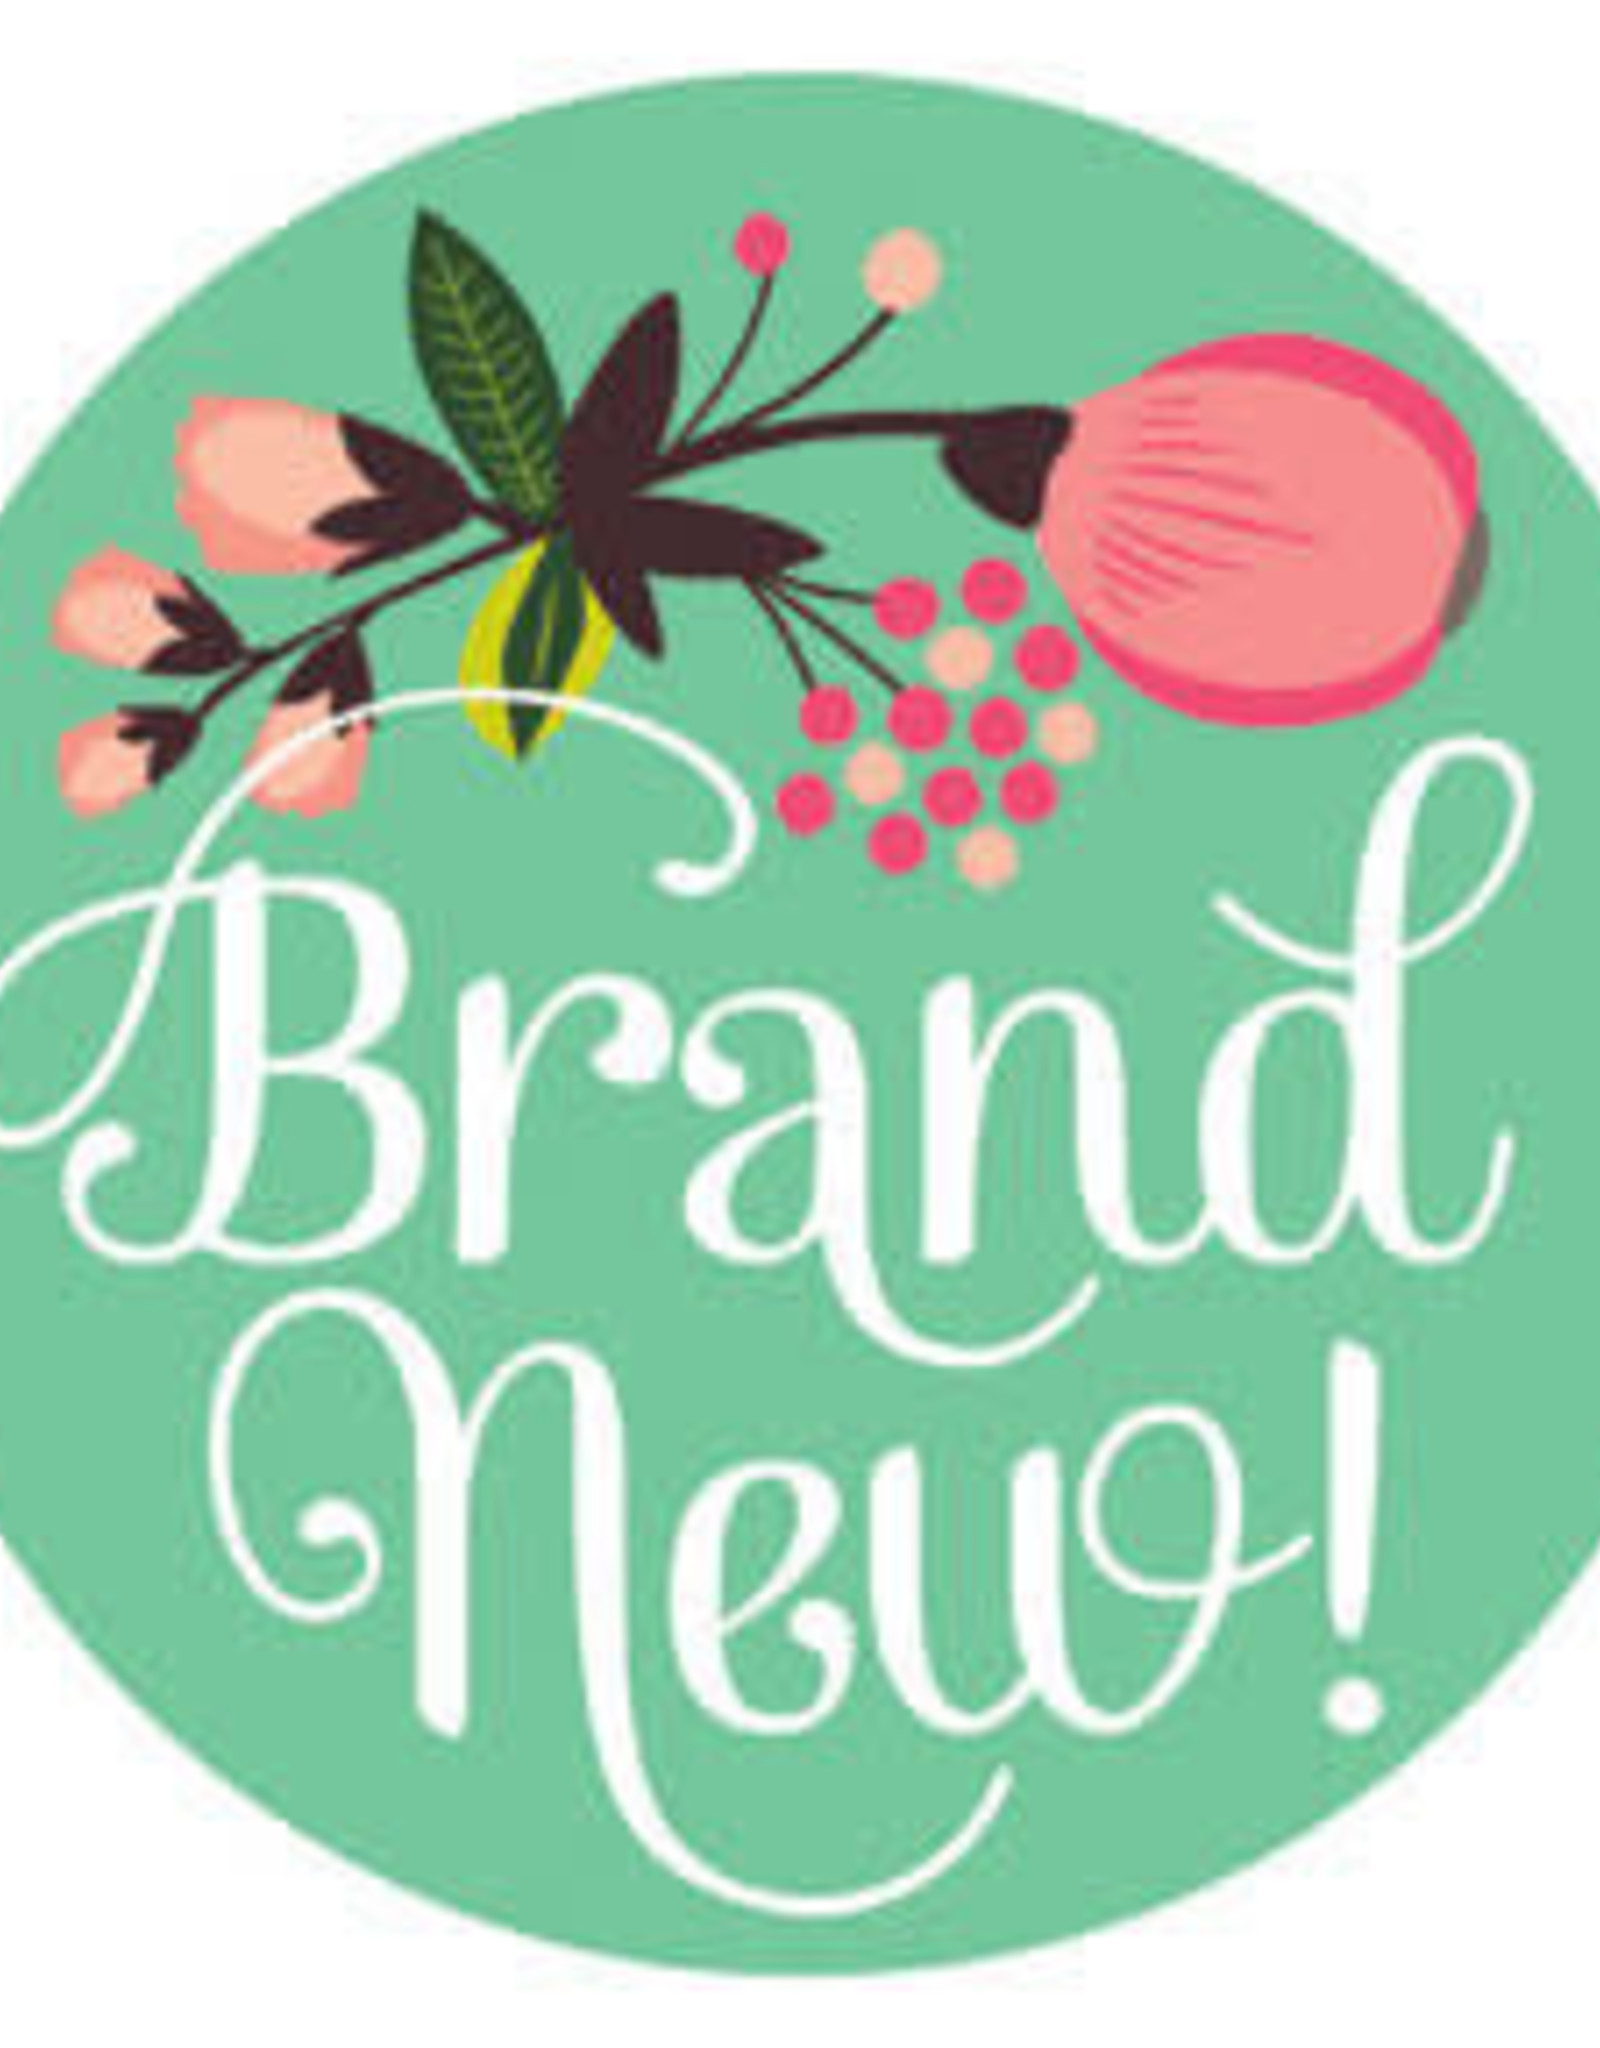 Lucy Darling Little Artist Brand New Sticker